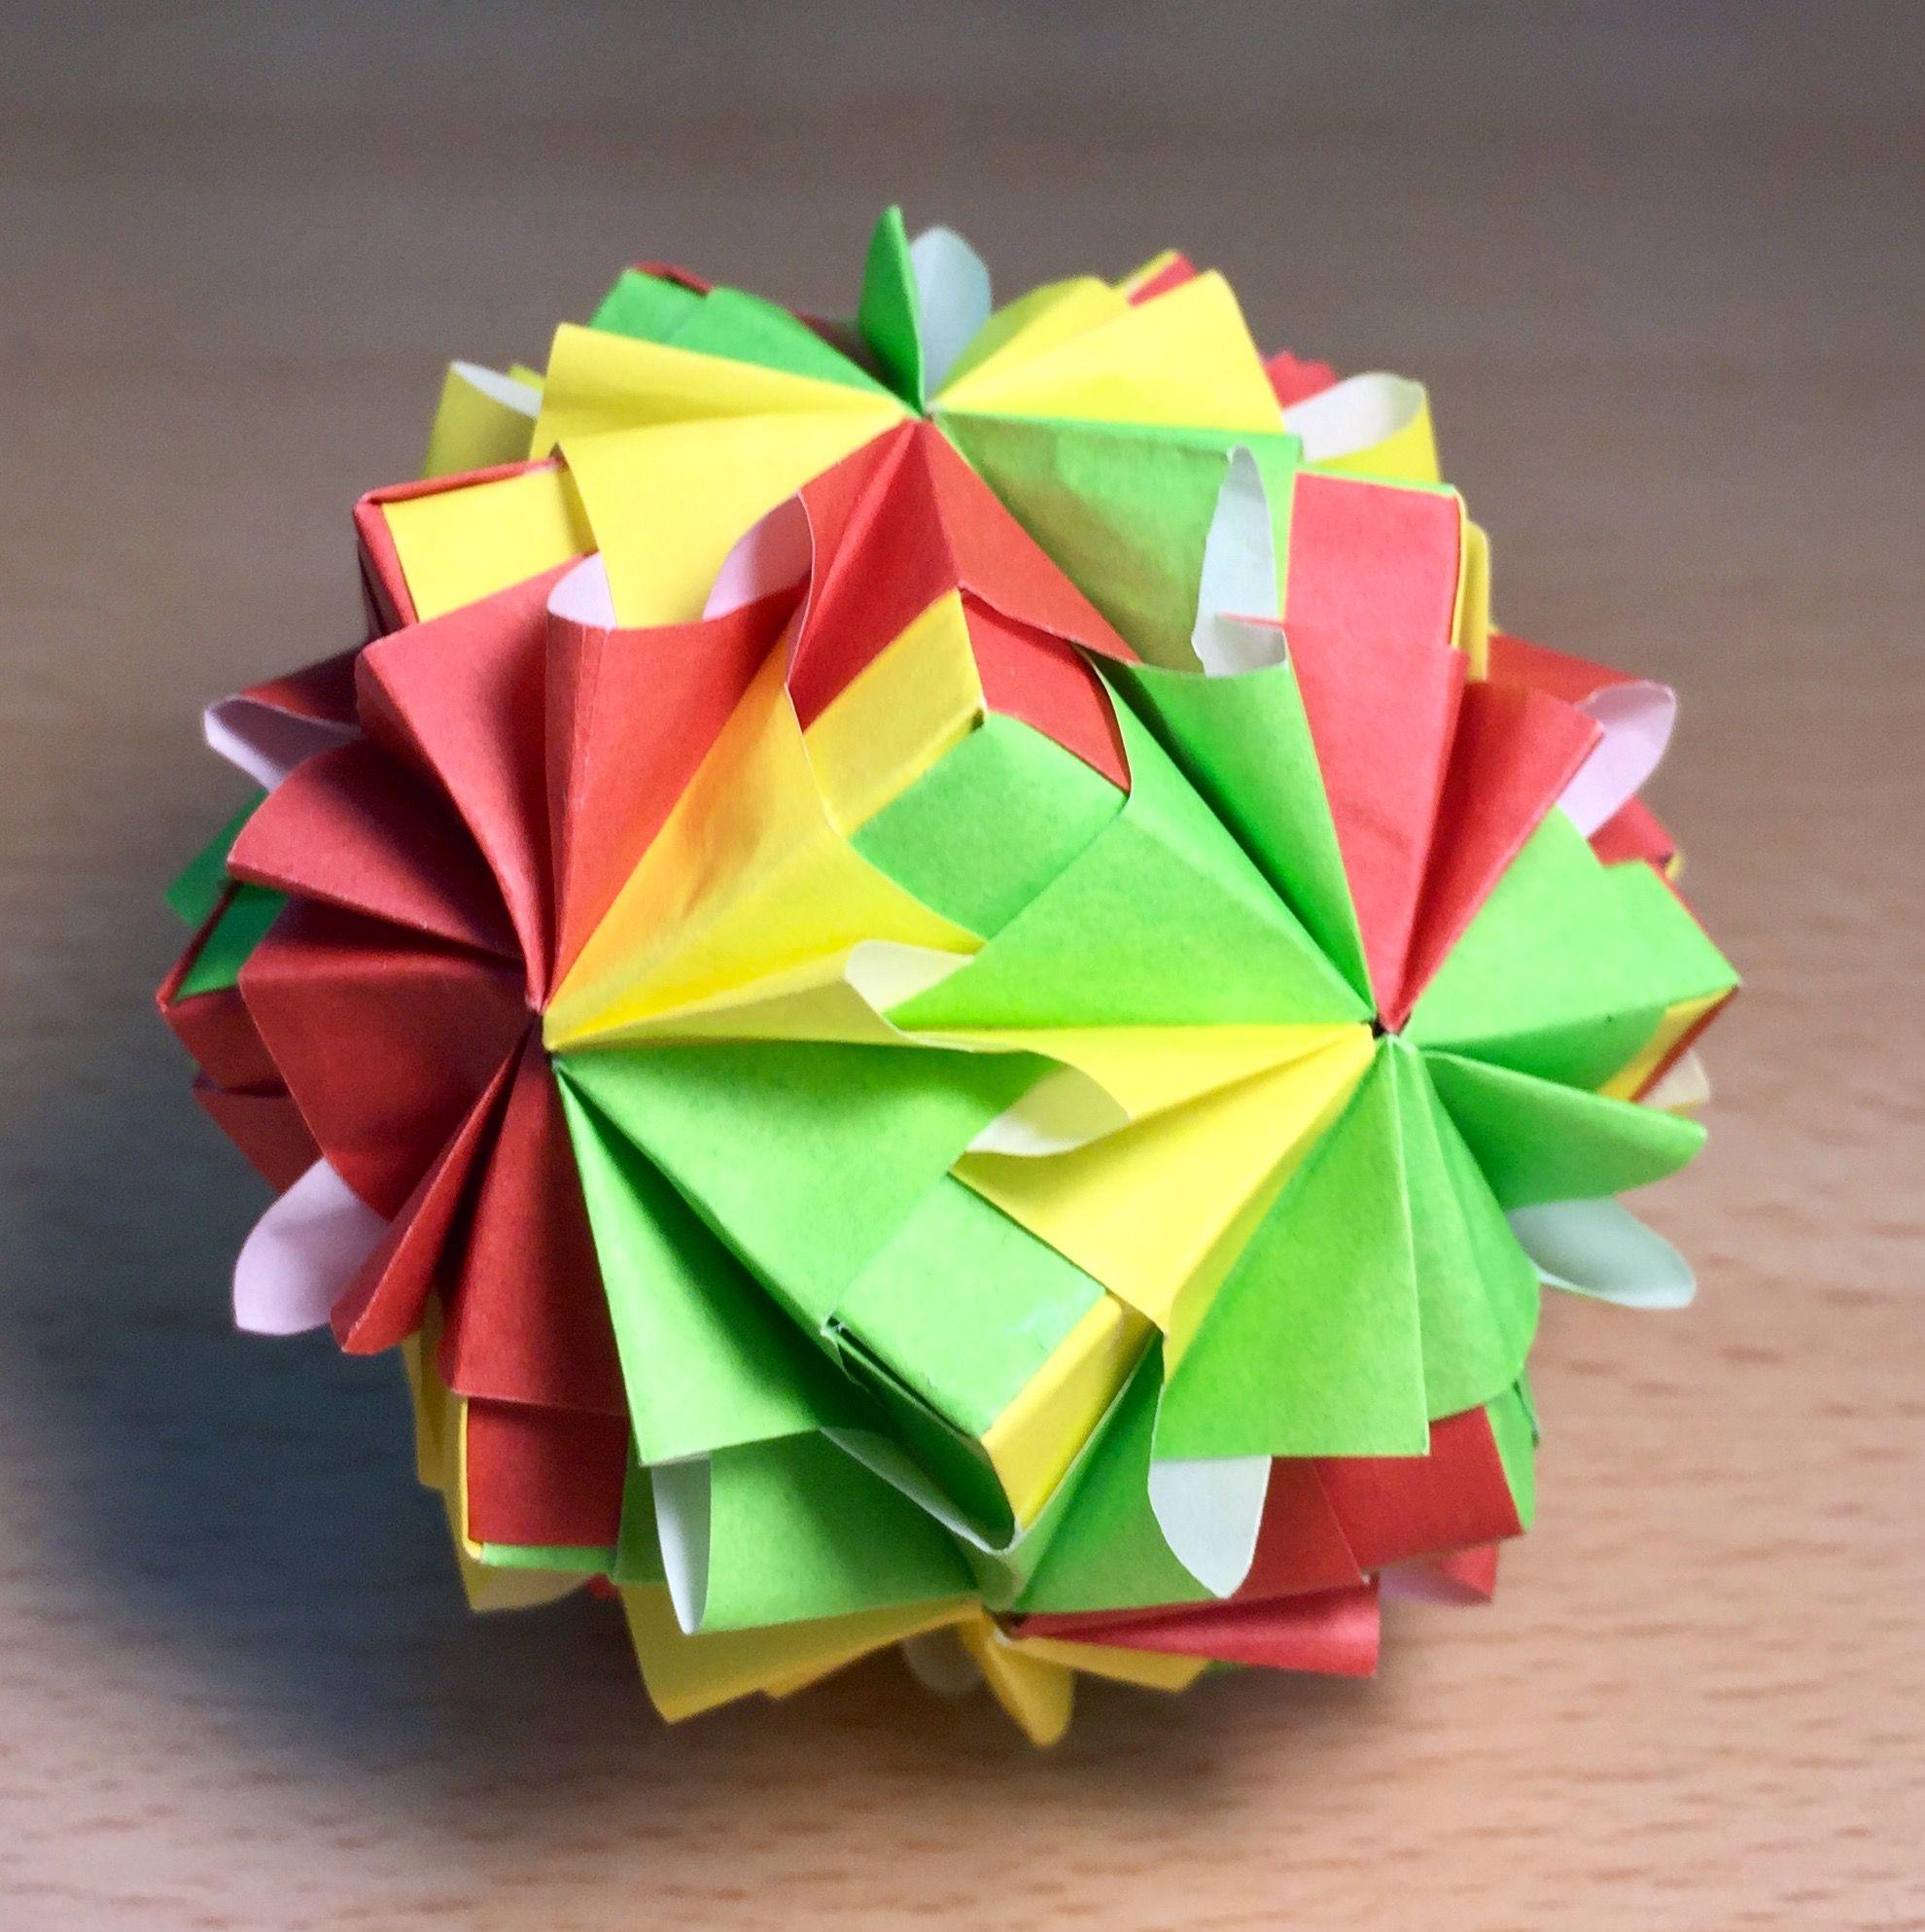 Origami Flower Ball Origami Pinterest Flower Ball And Origami